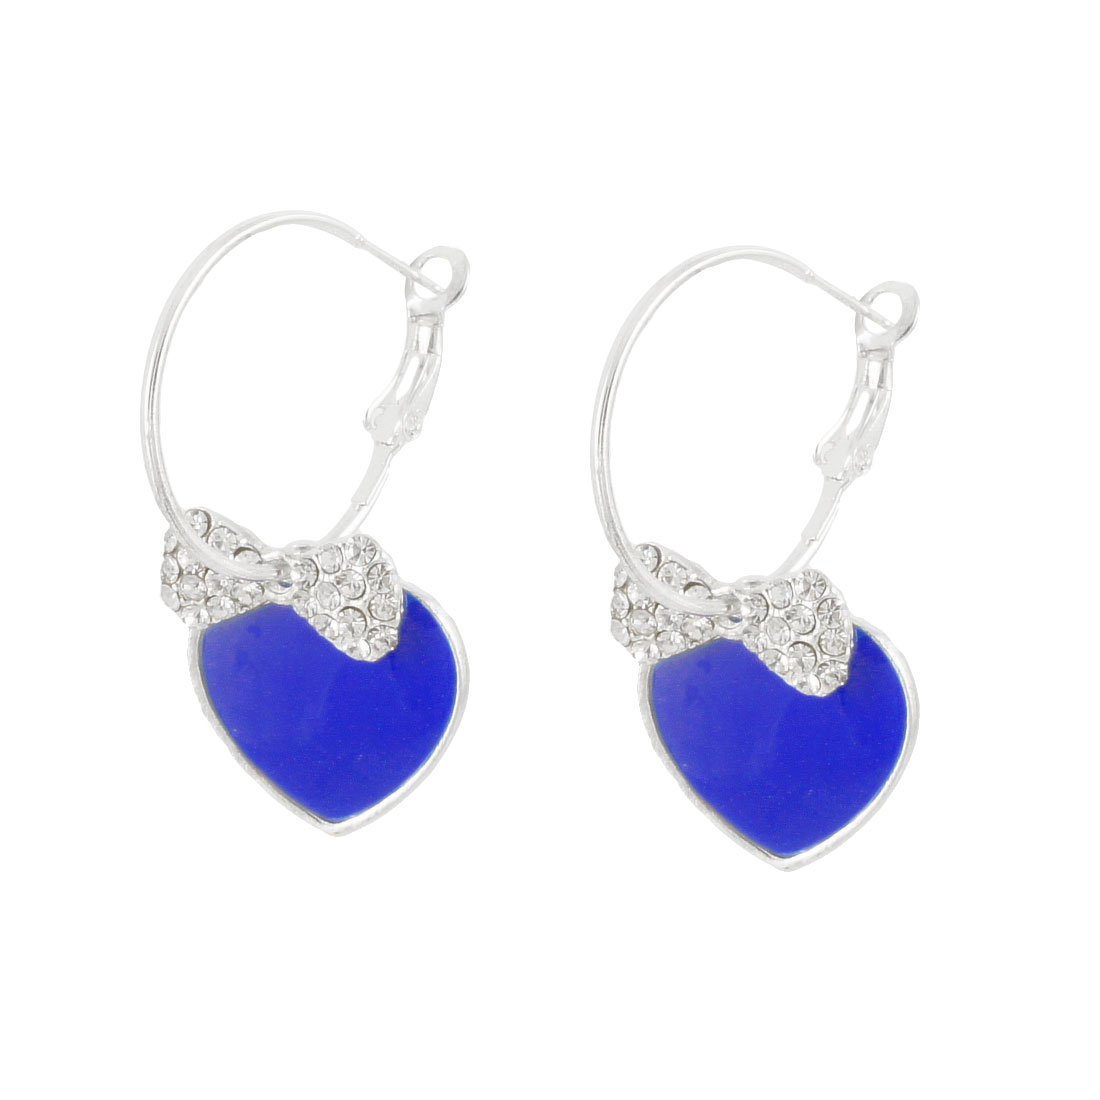 Lady Rhinestone Decor Blue Heart Shape Hoop Earrings Pair